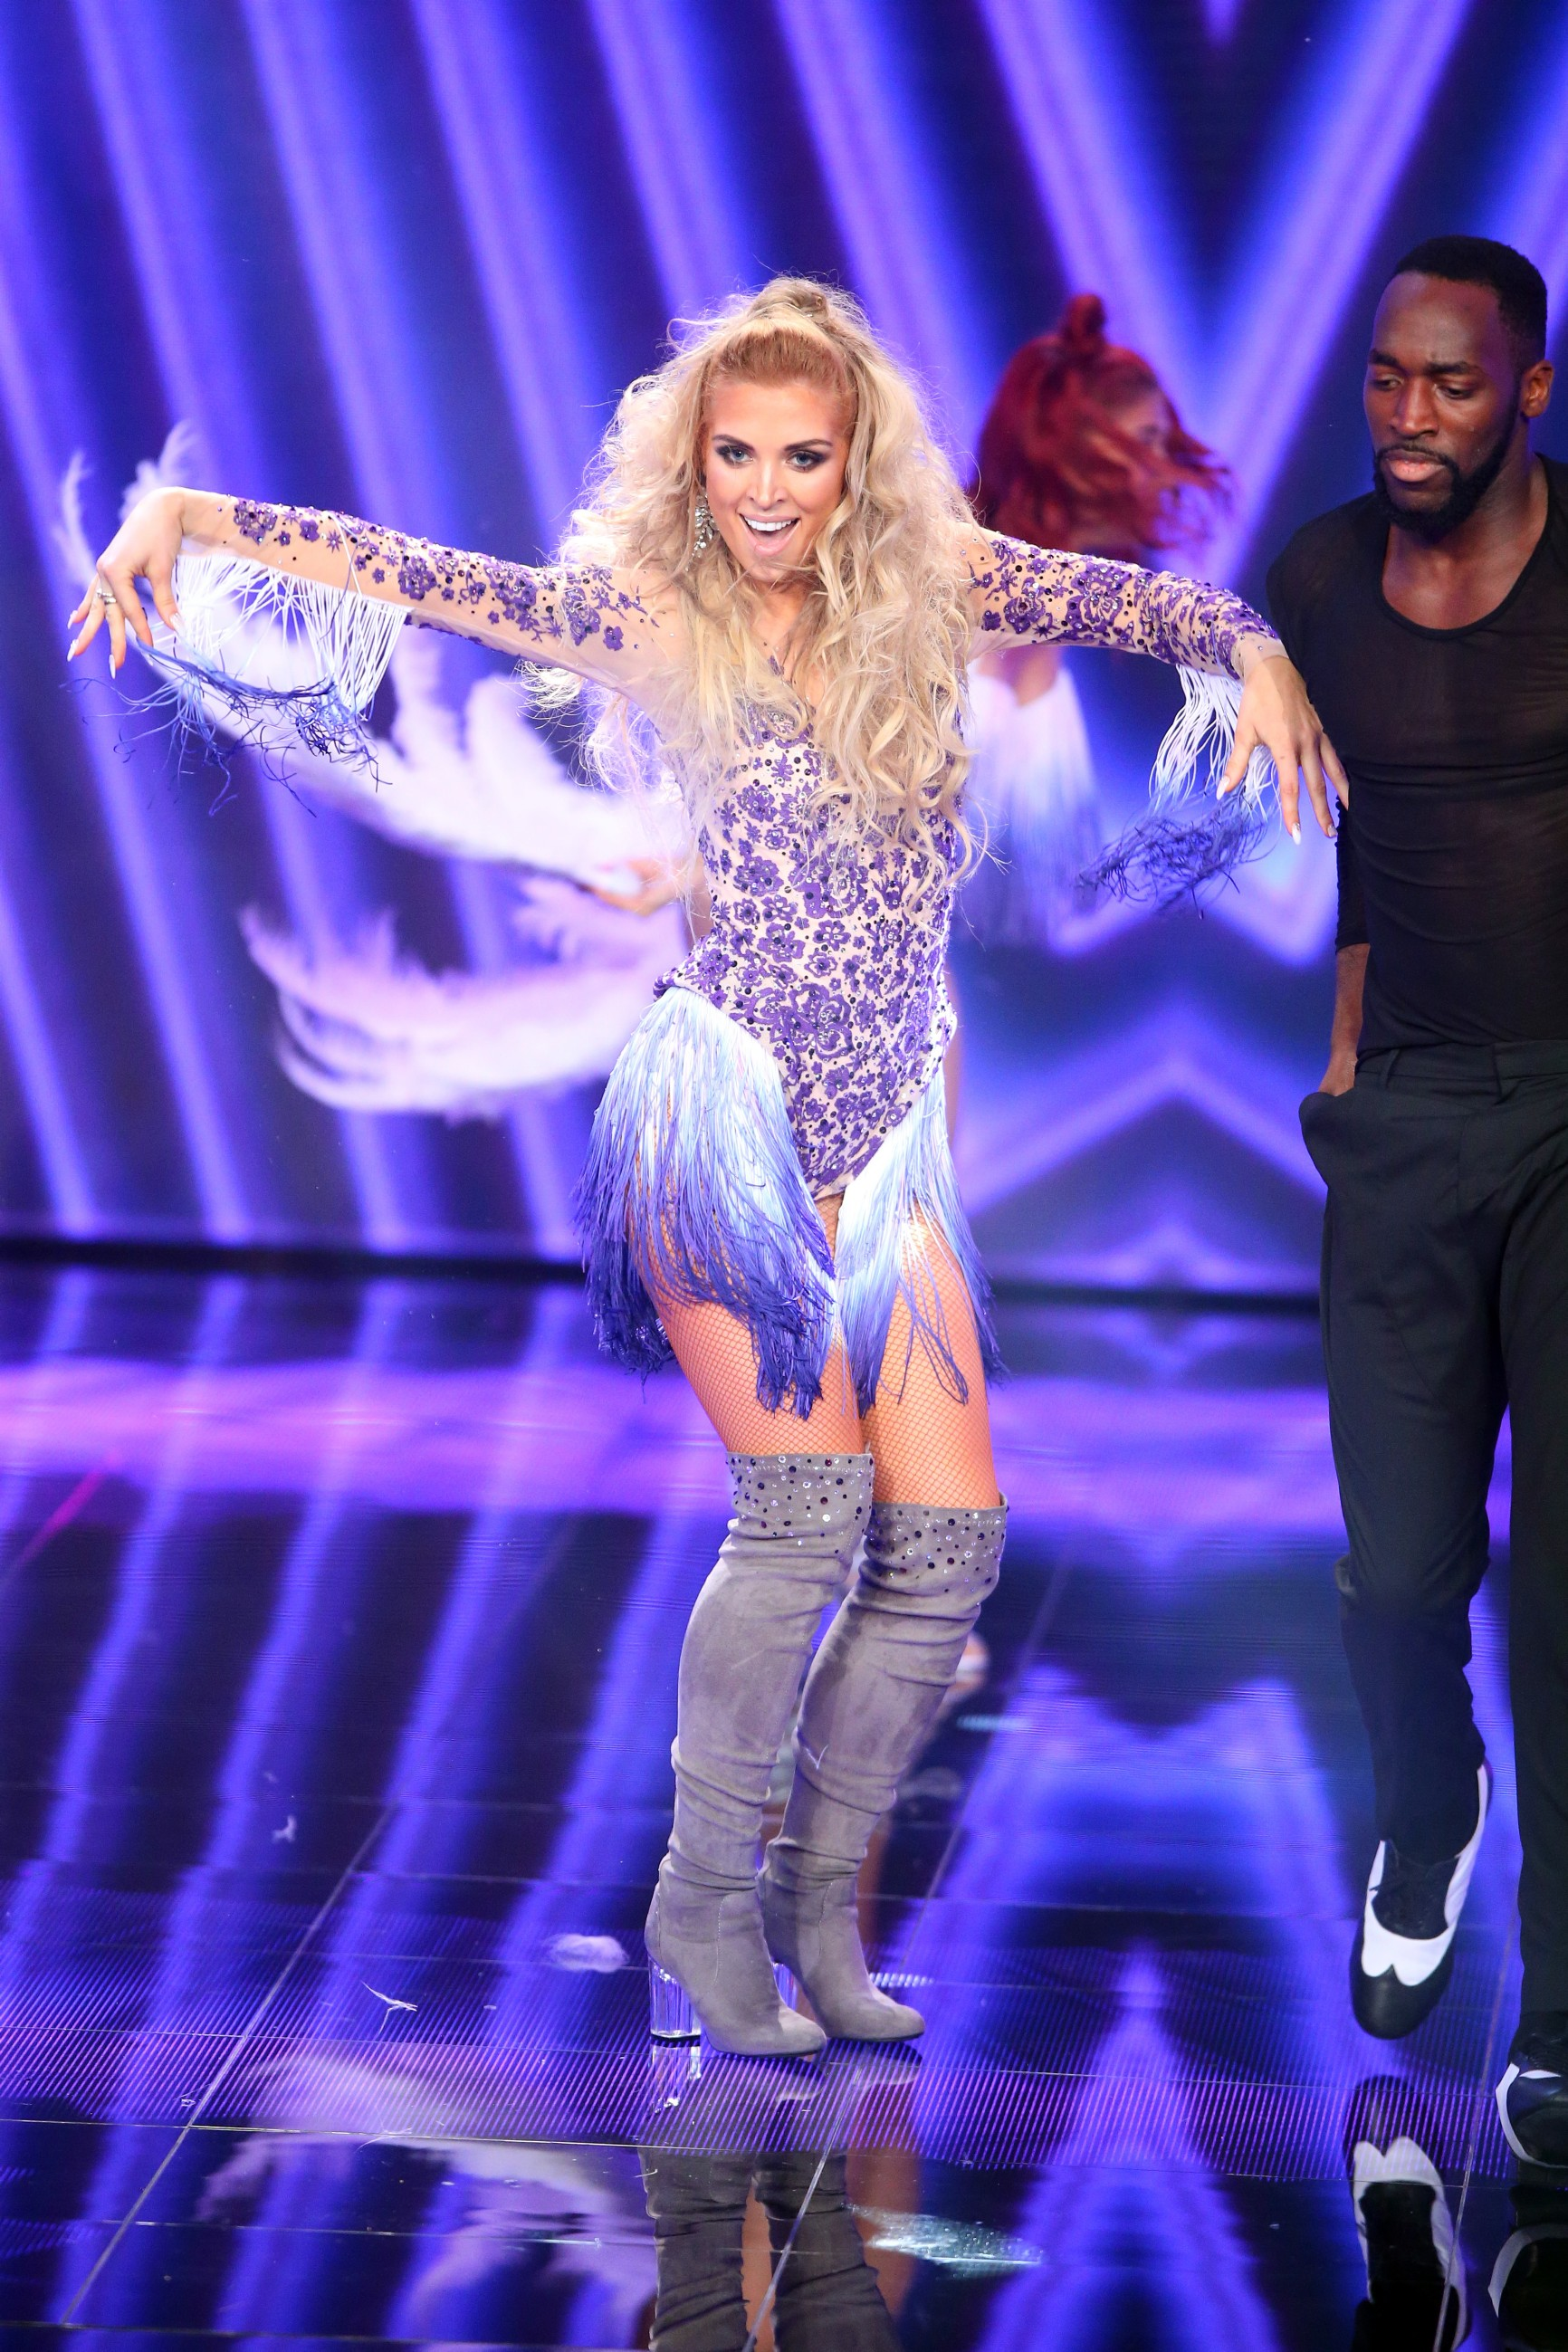 Dance Dance Dance Halbfinale - Aneta Sablik bei ihrem Solo